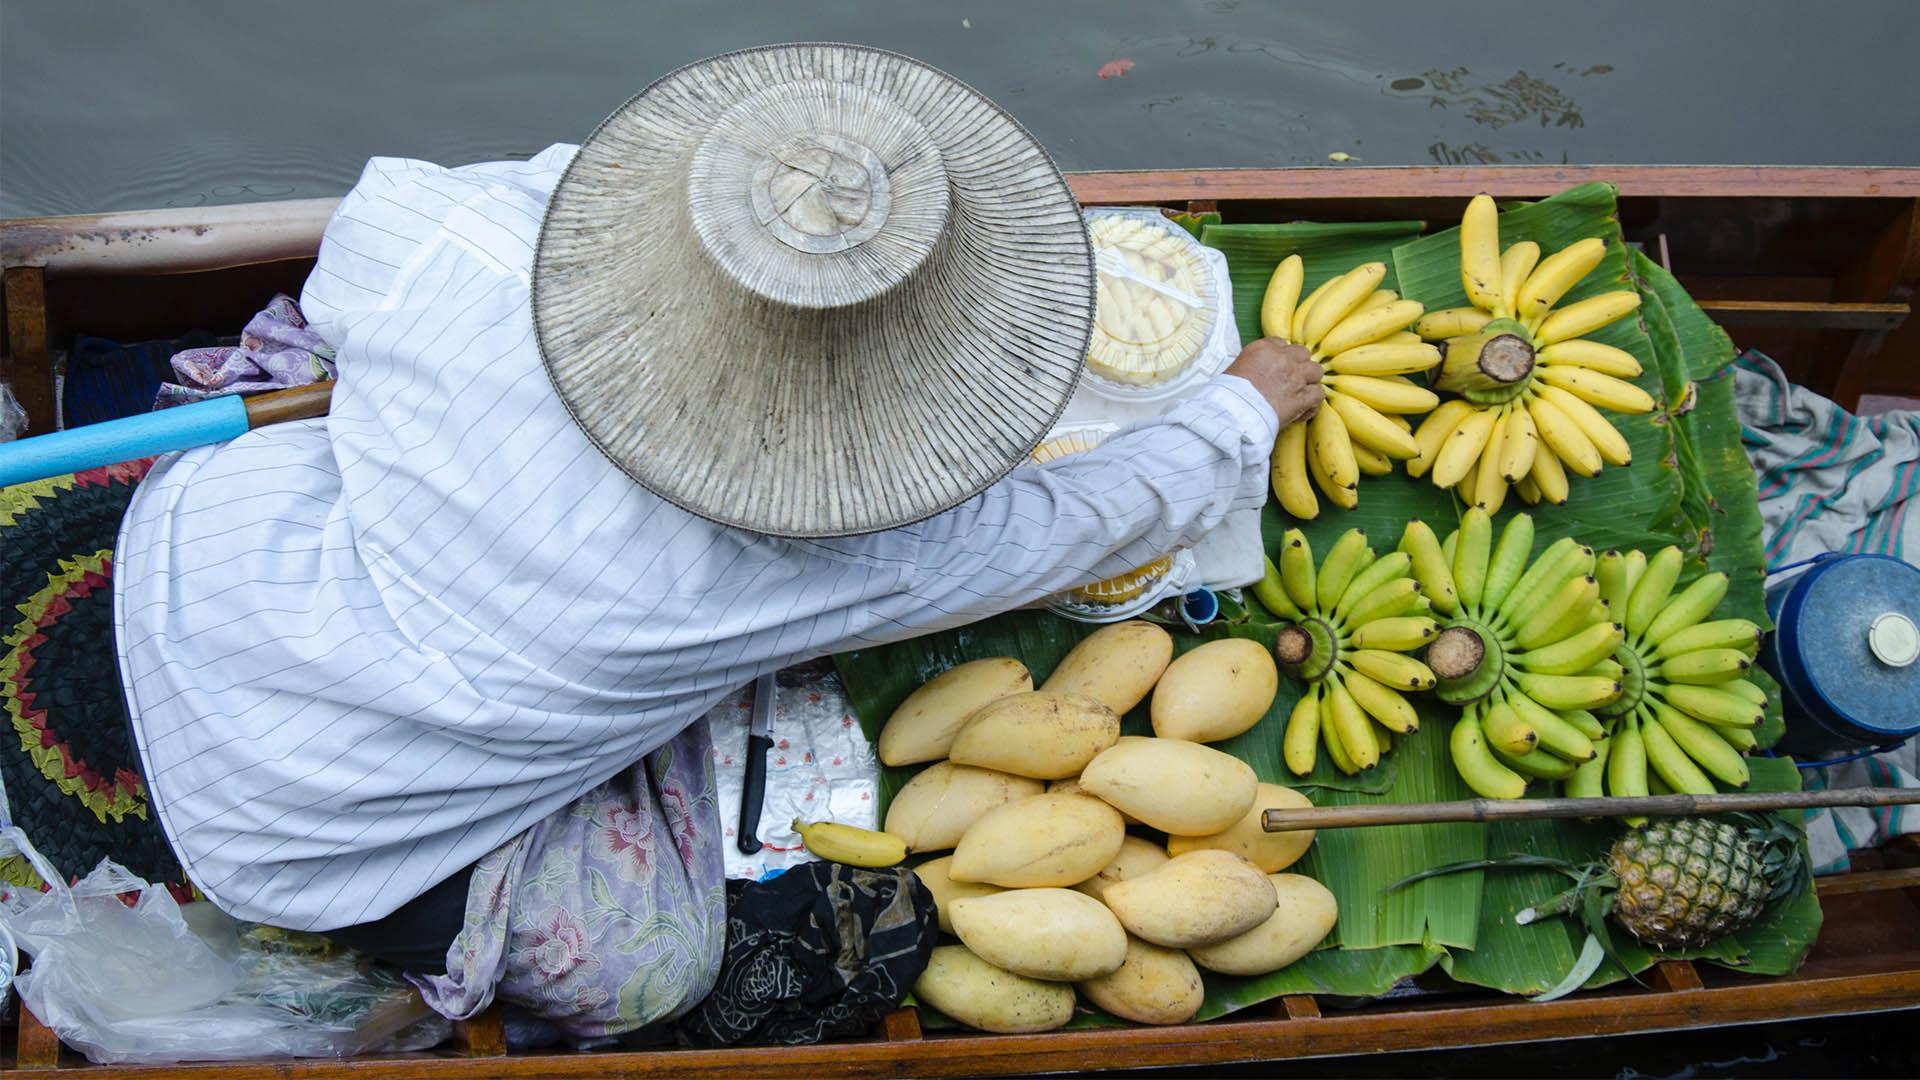 A culinary journey across Thailand